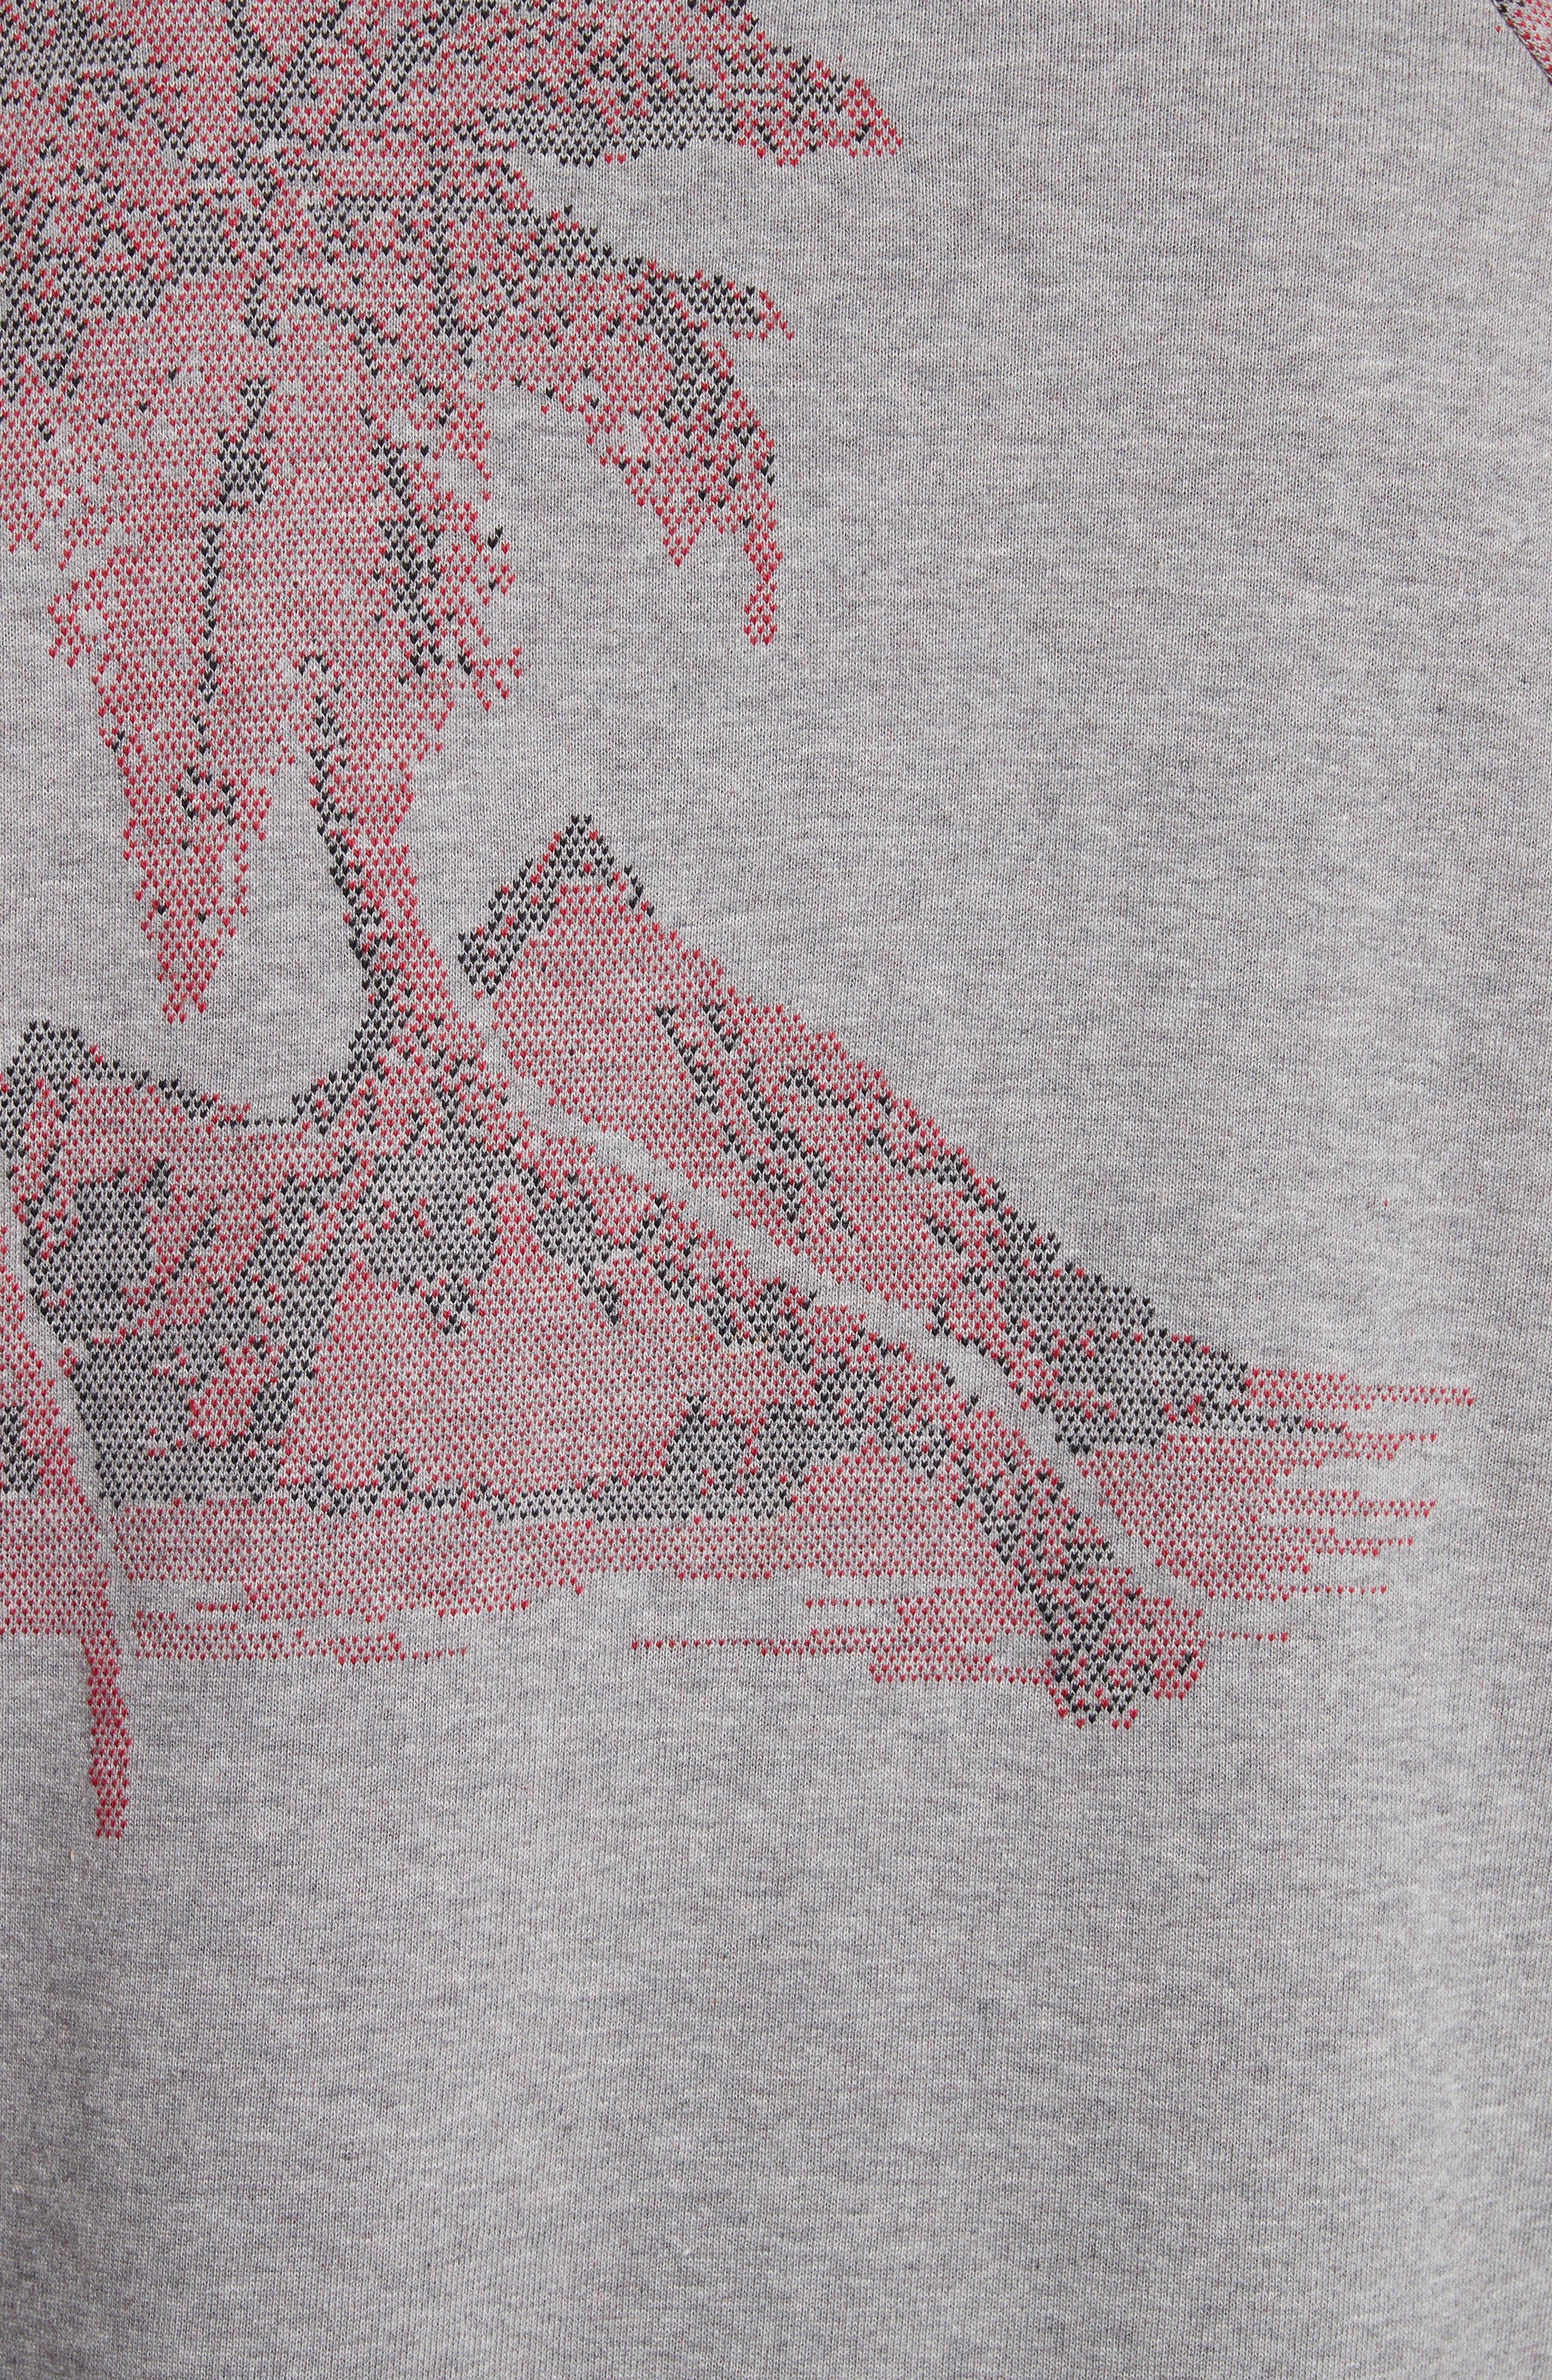 Crewneck Sweatshirt,                             Alternate thumbnail 5, color,                             24 Grey